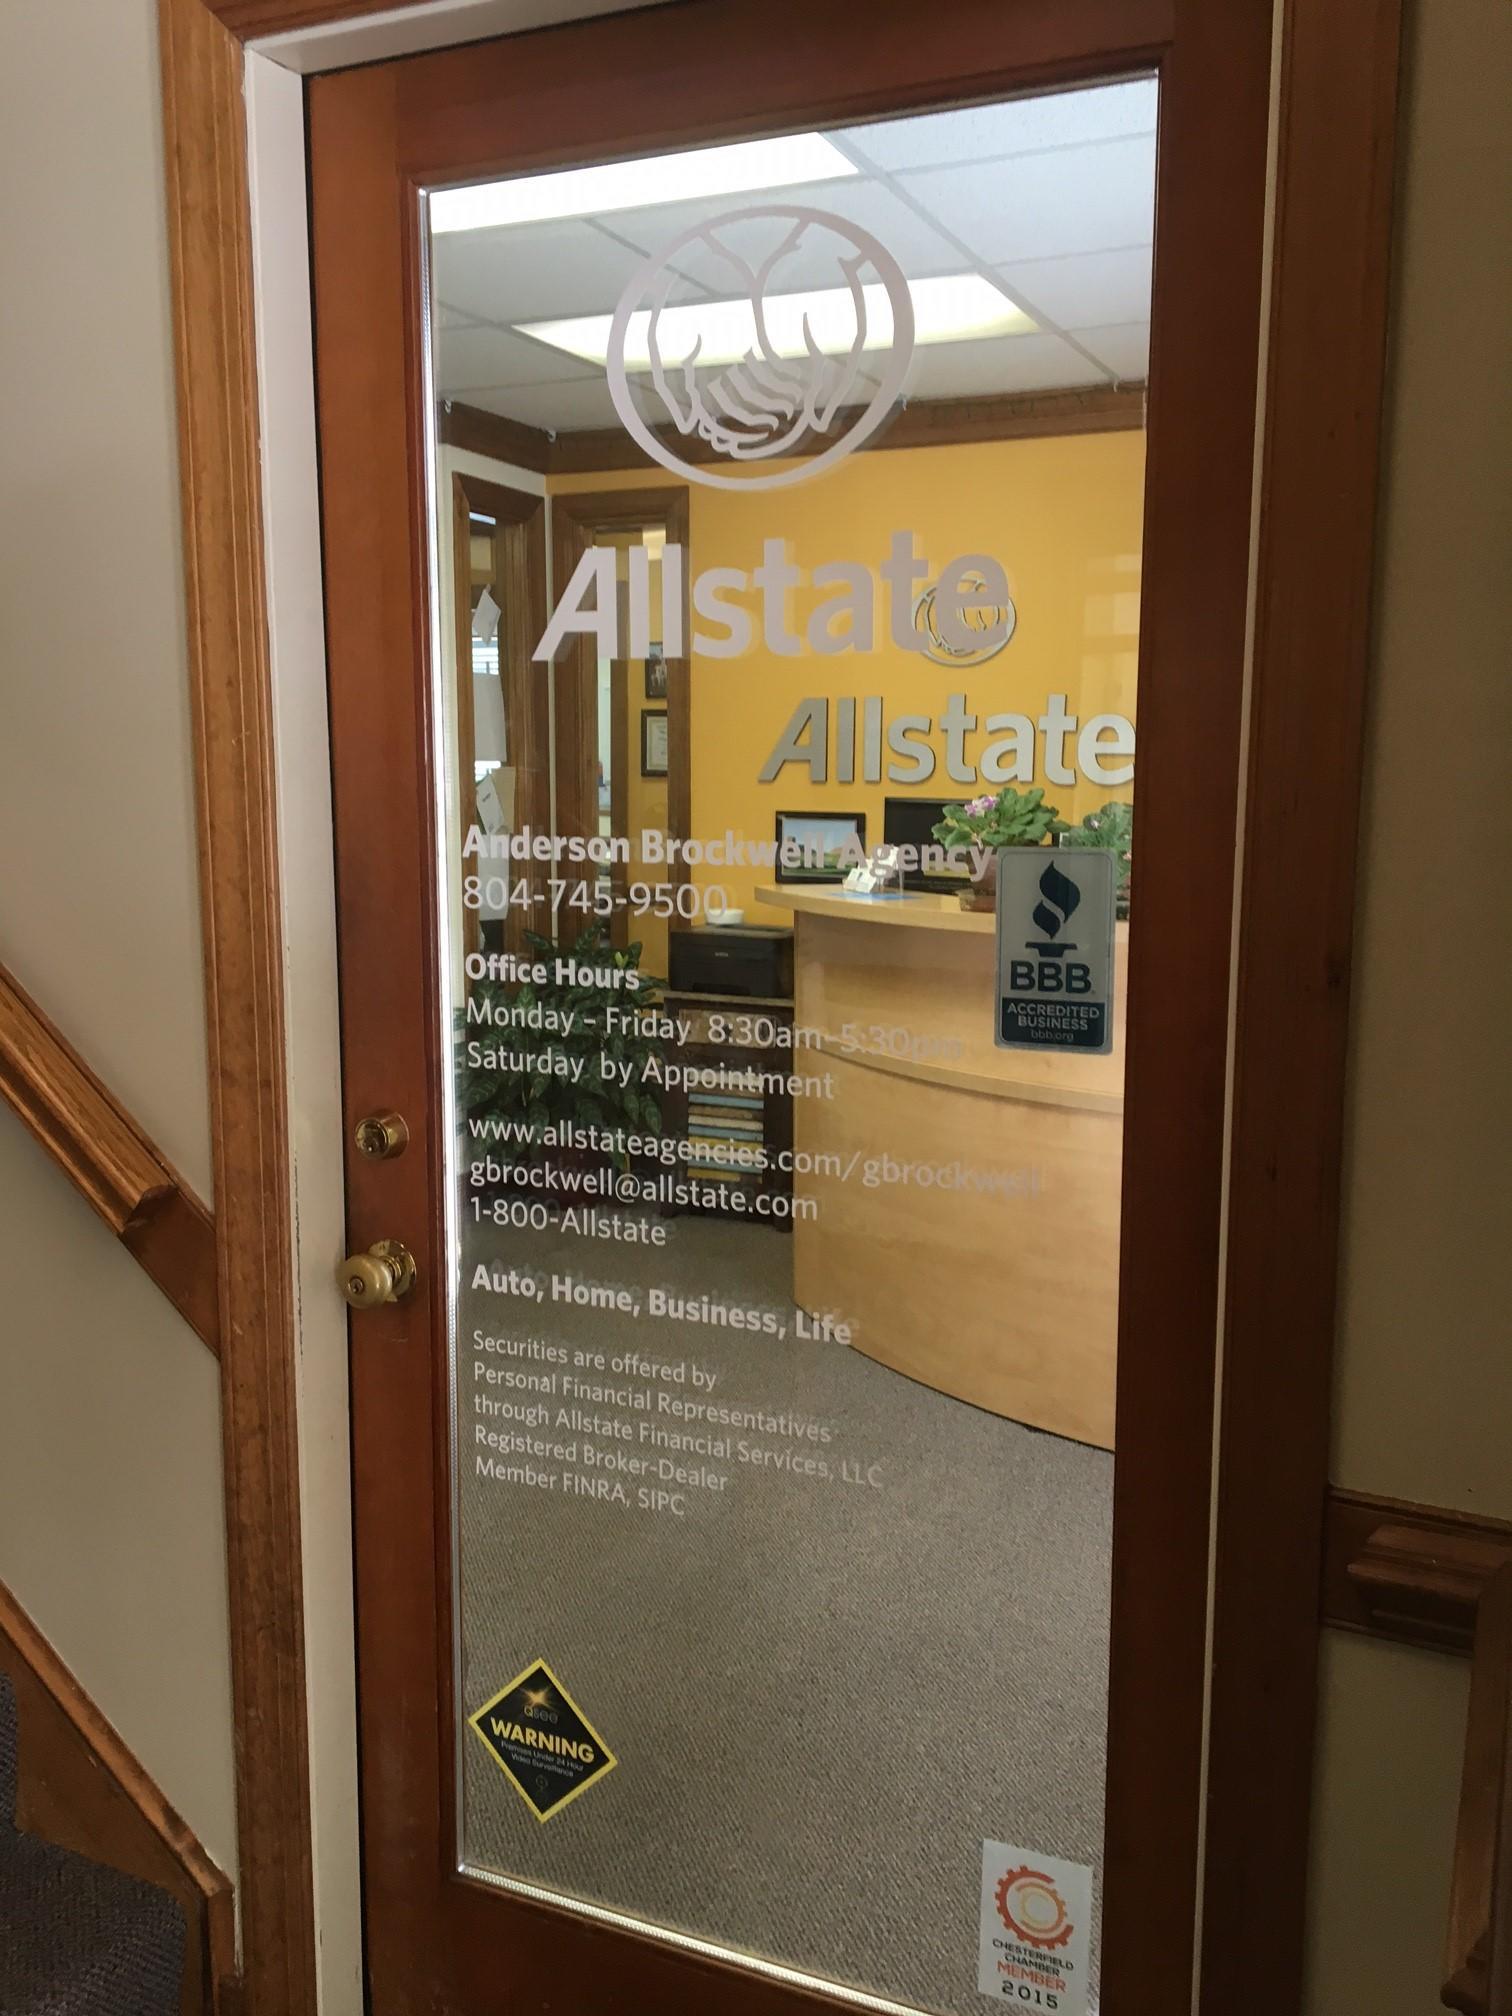 Virginia Brockwell: Allstate Insurance image 5